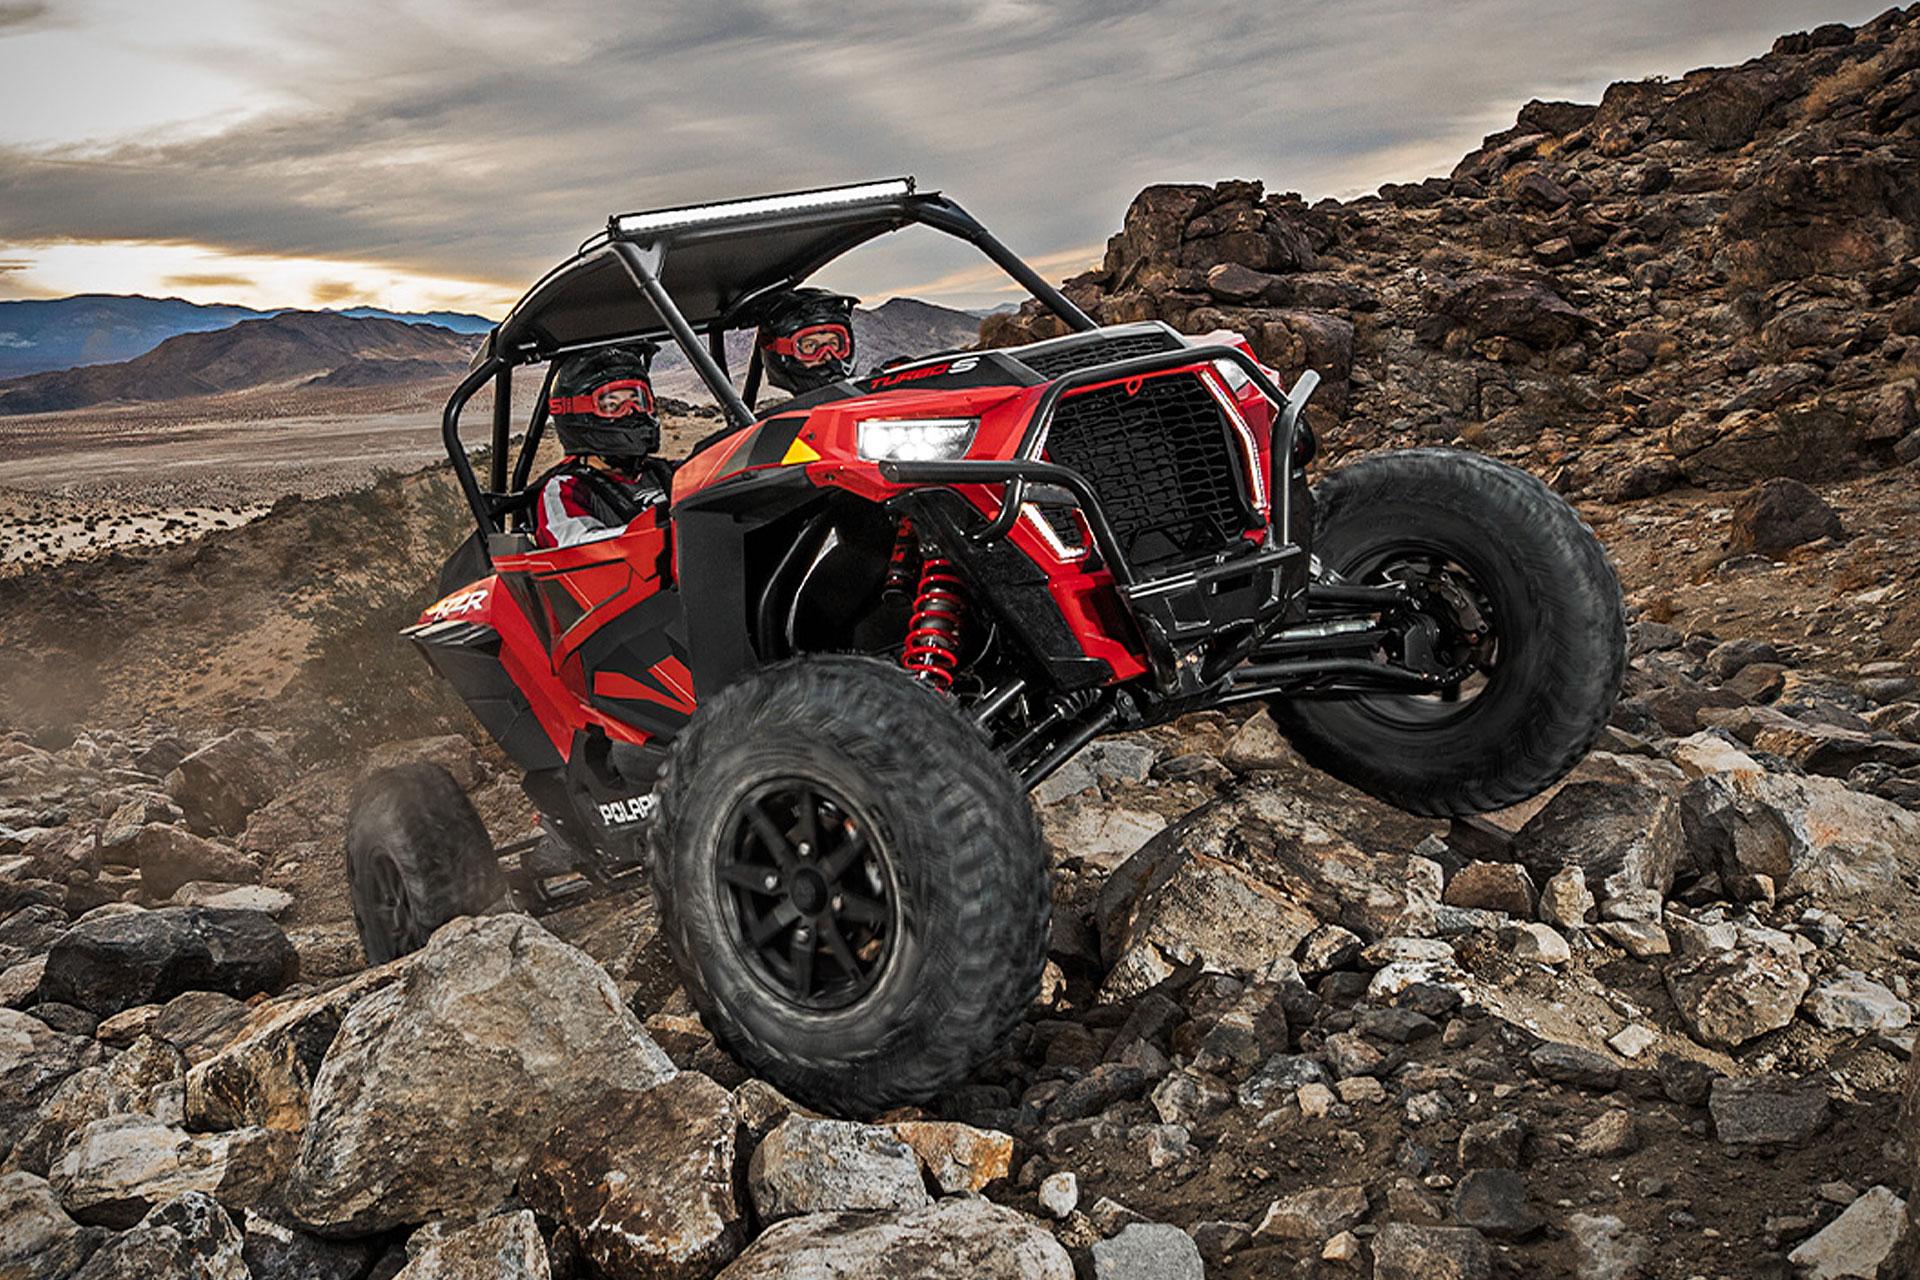 Polaris Side By Side >> Polaris RZR XP Turbo S ATV | Uncrate